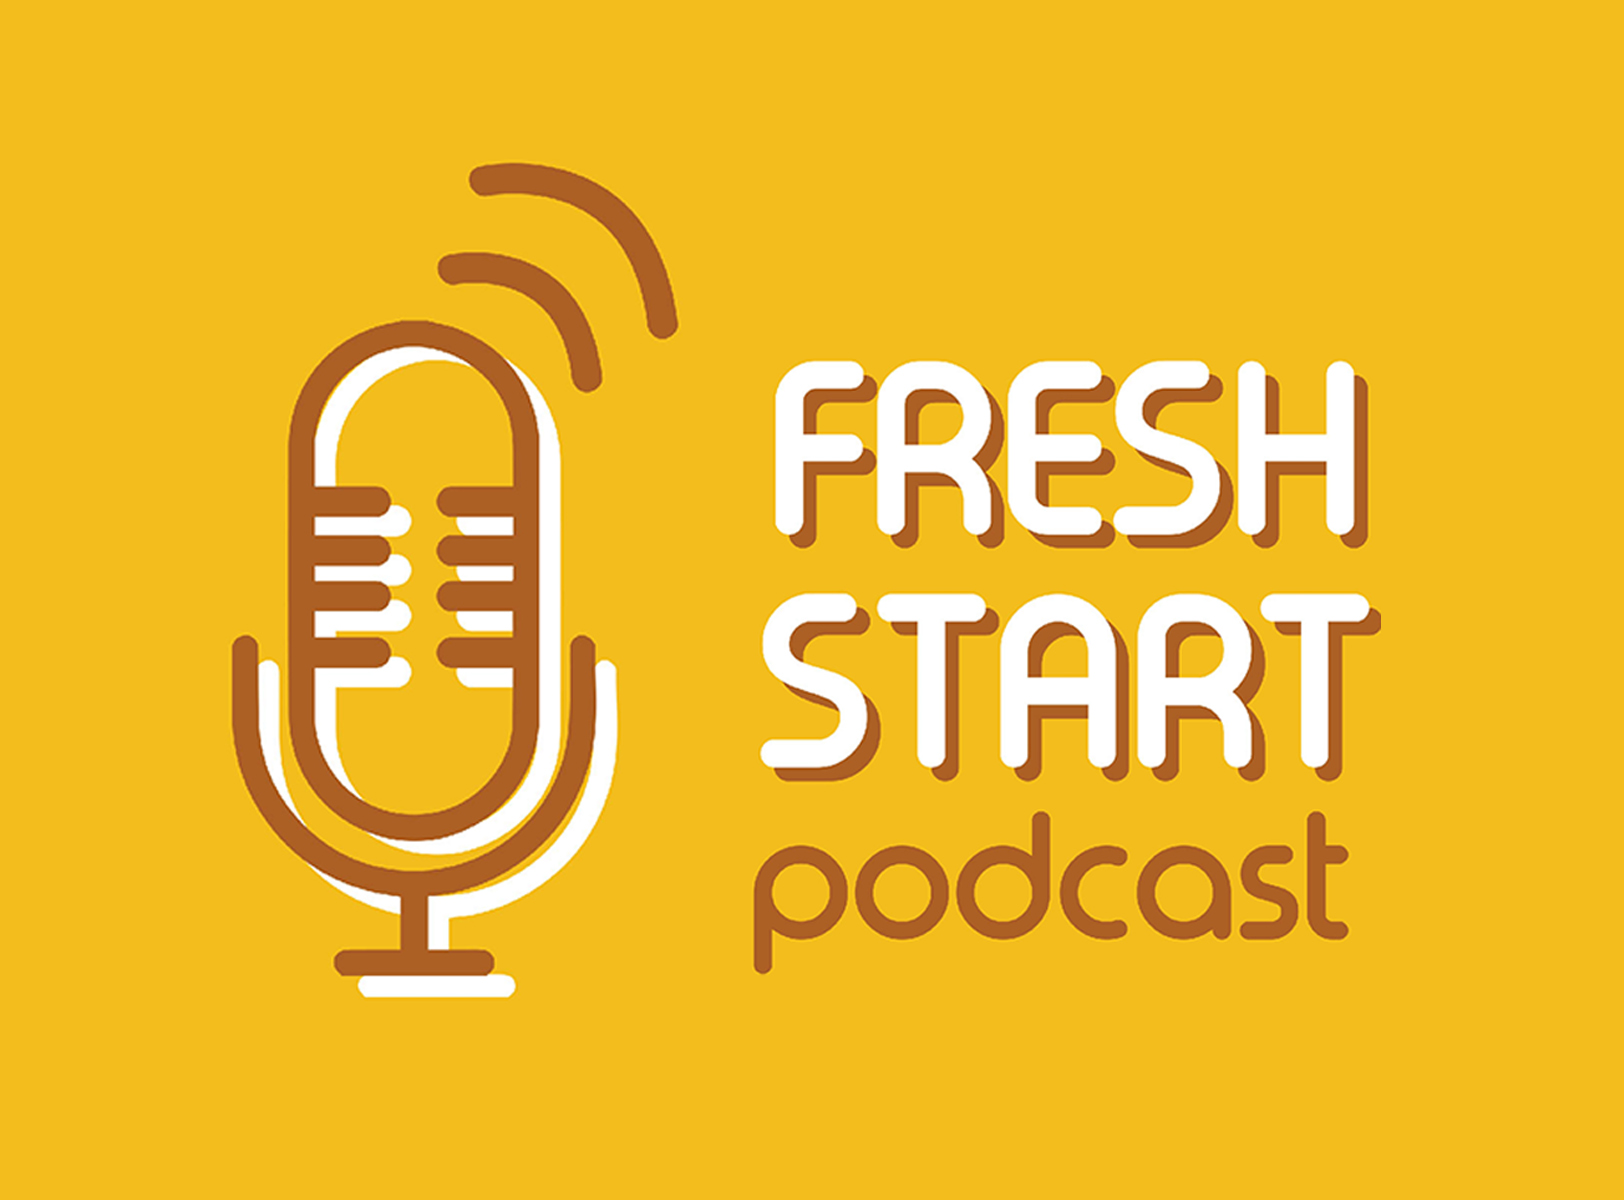 Fresh Start: Podcast News (4/15/2019 Mon.)